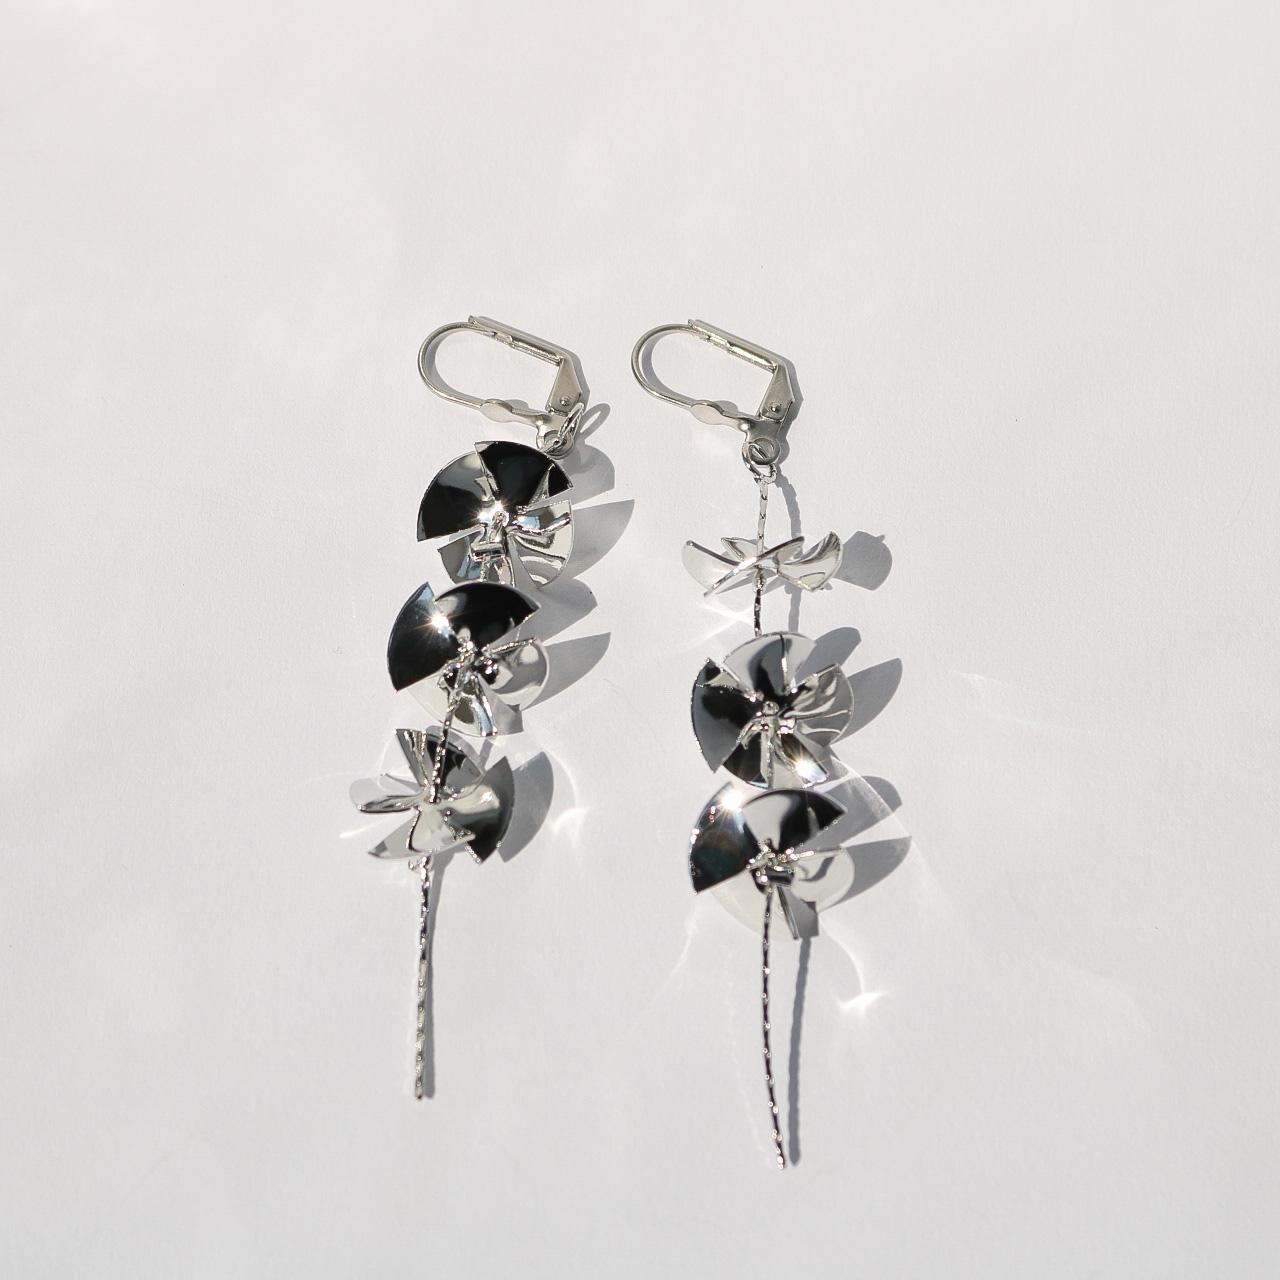 Windmill Pierce/Earring(金属アレルギー対応)